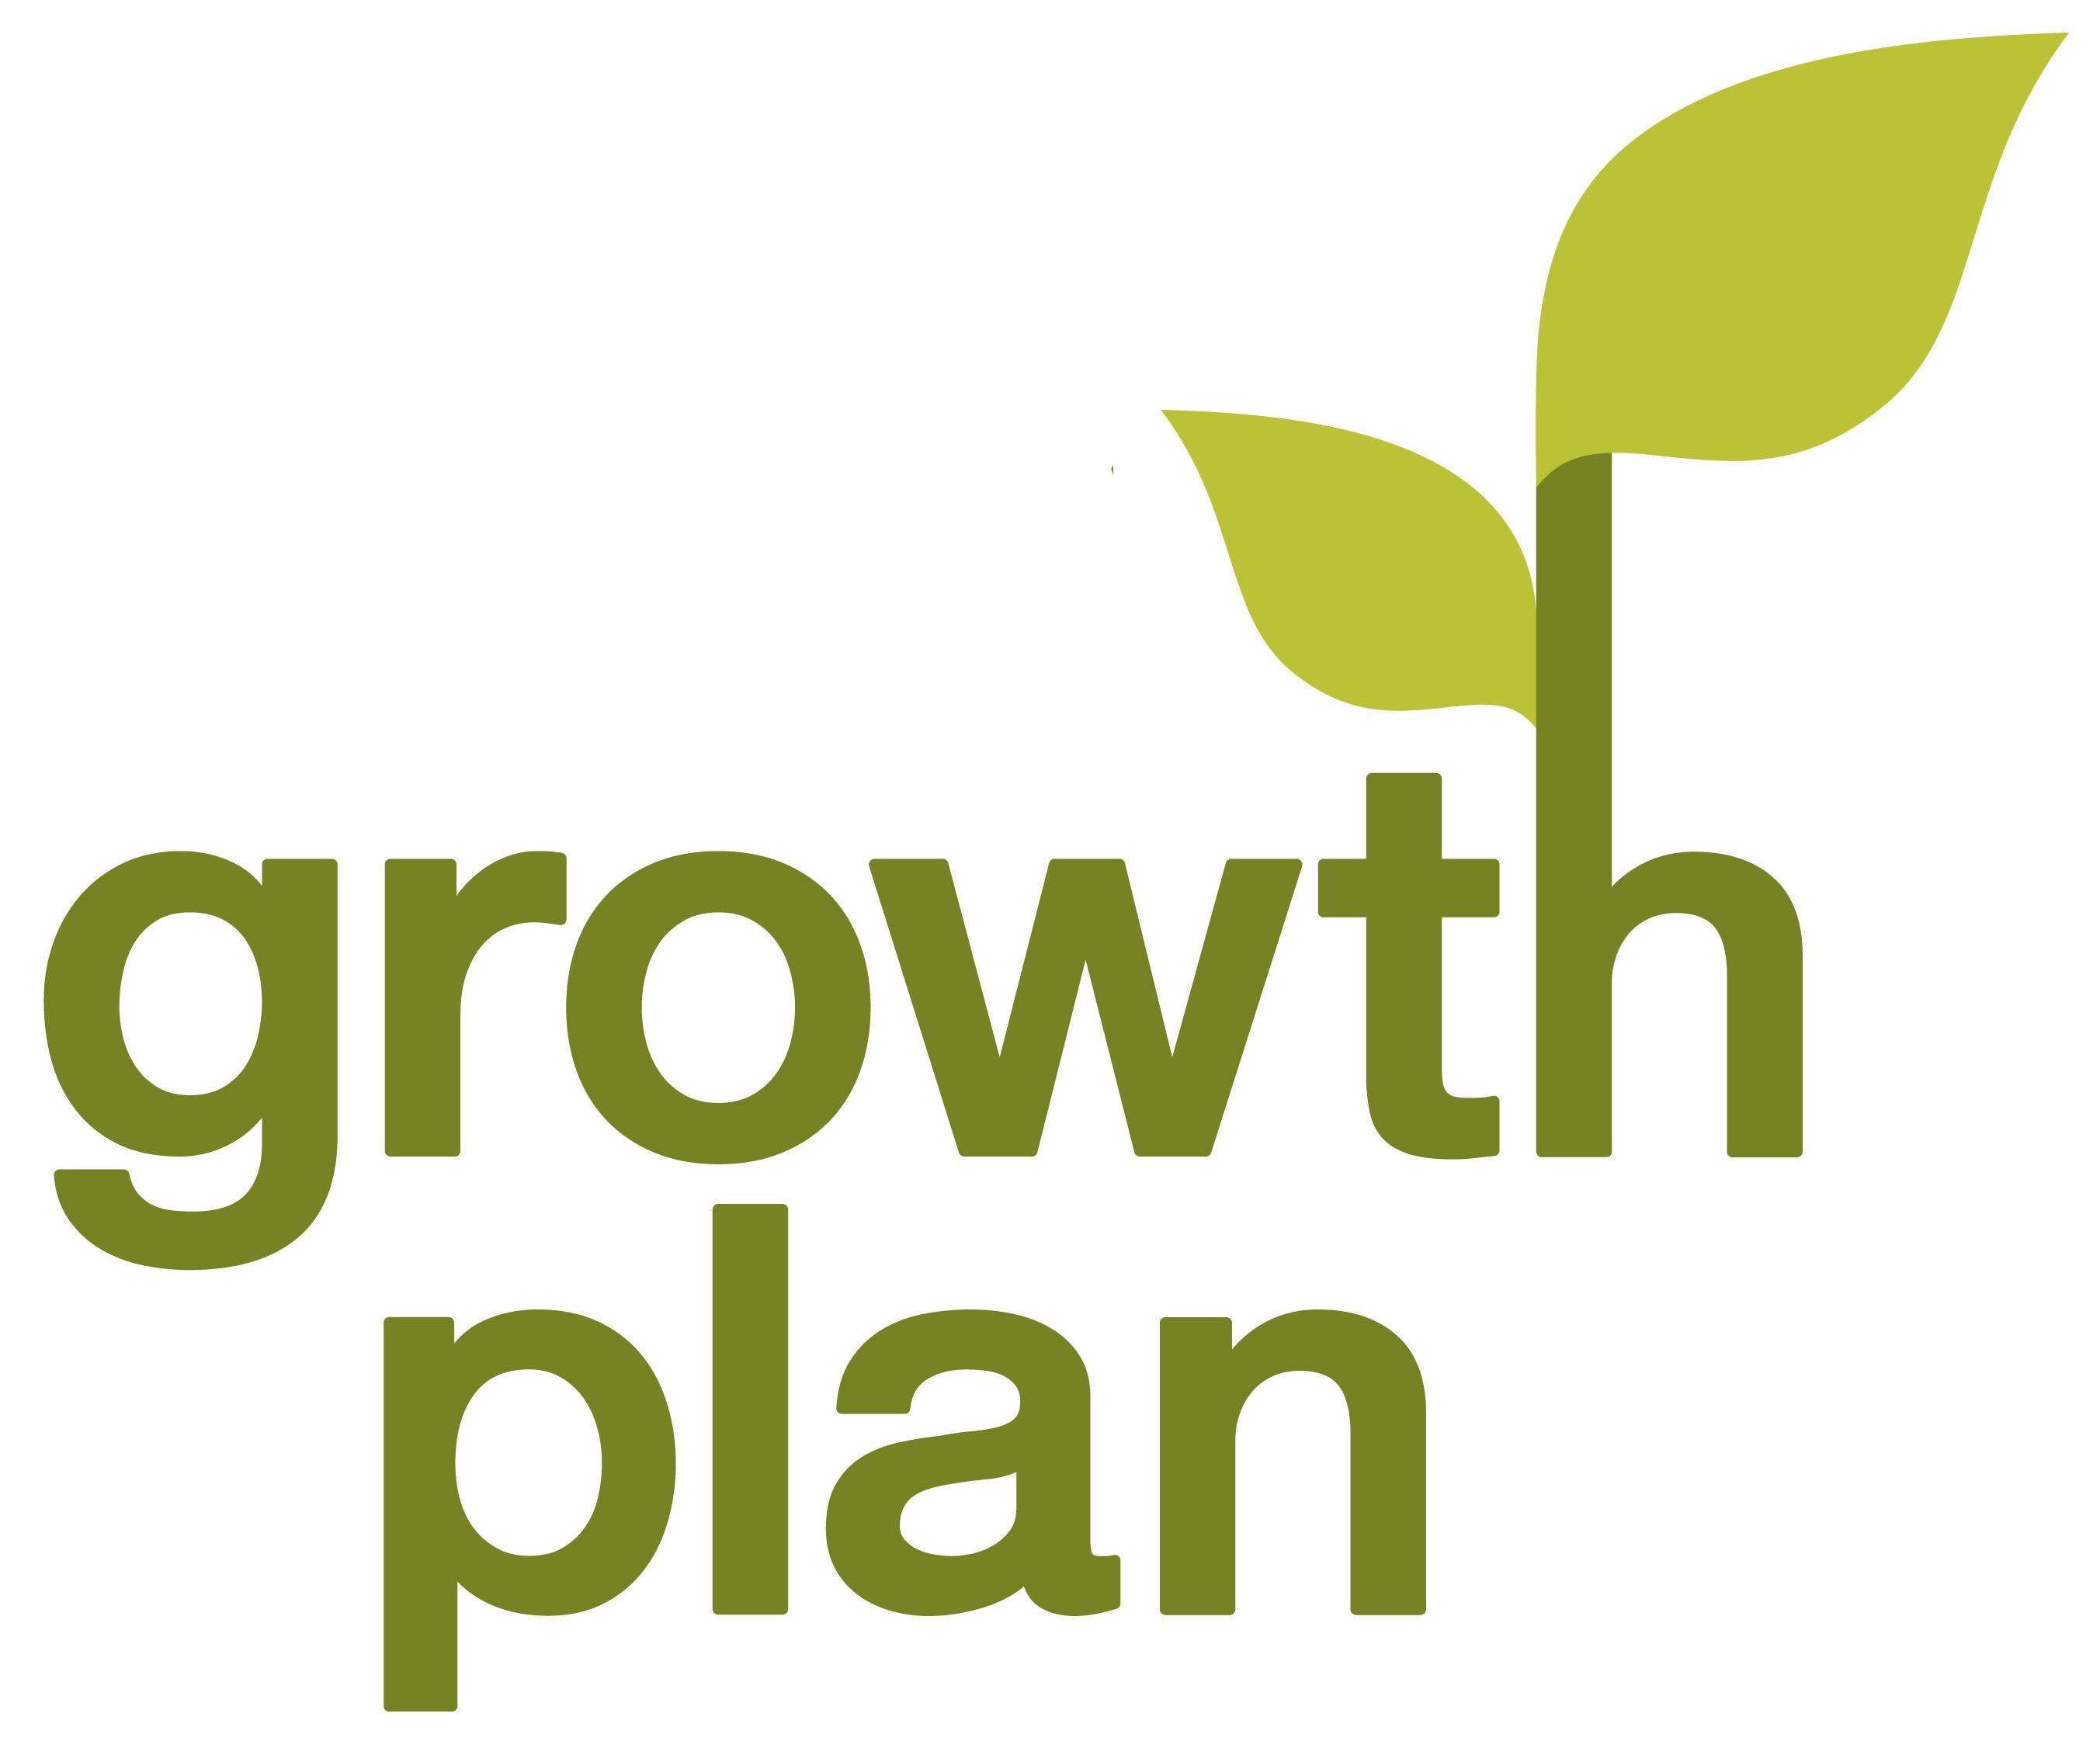 School Growth Plan 2018 - 2021